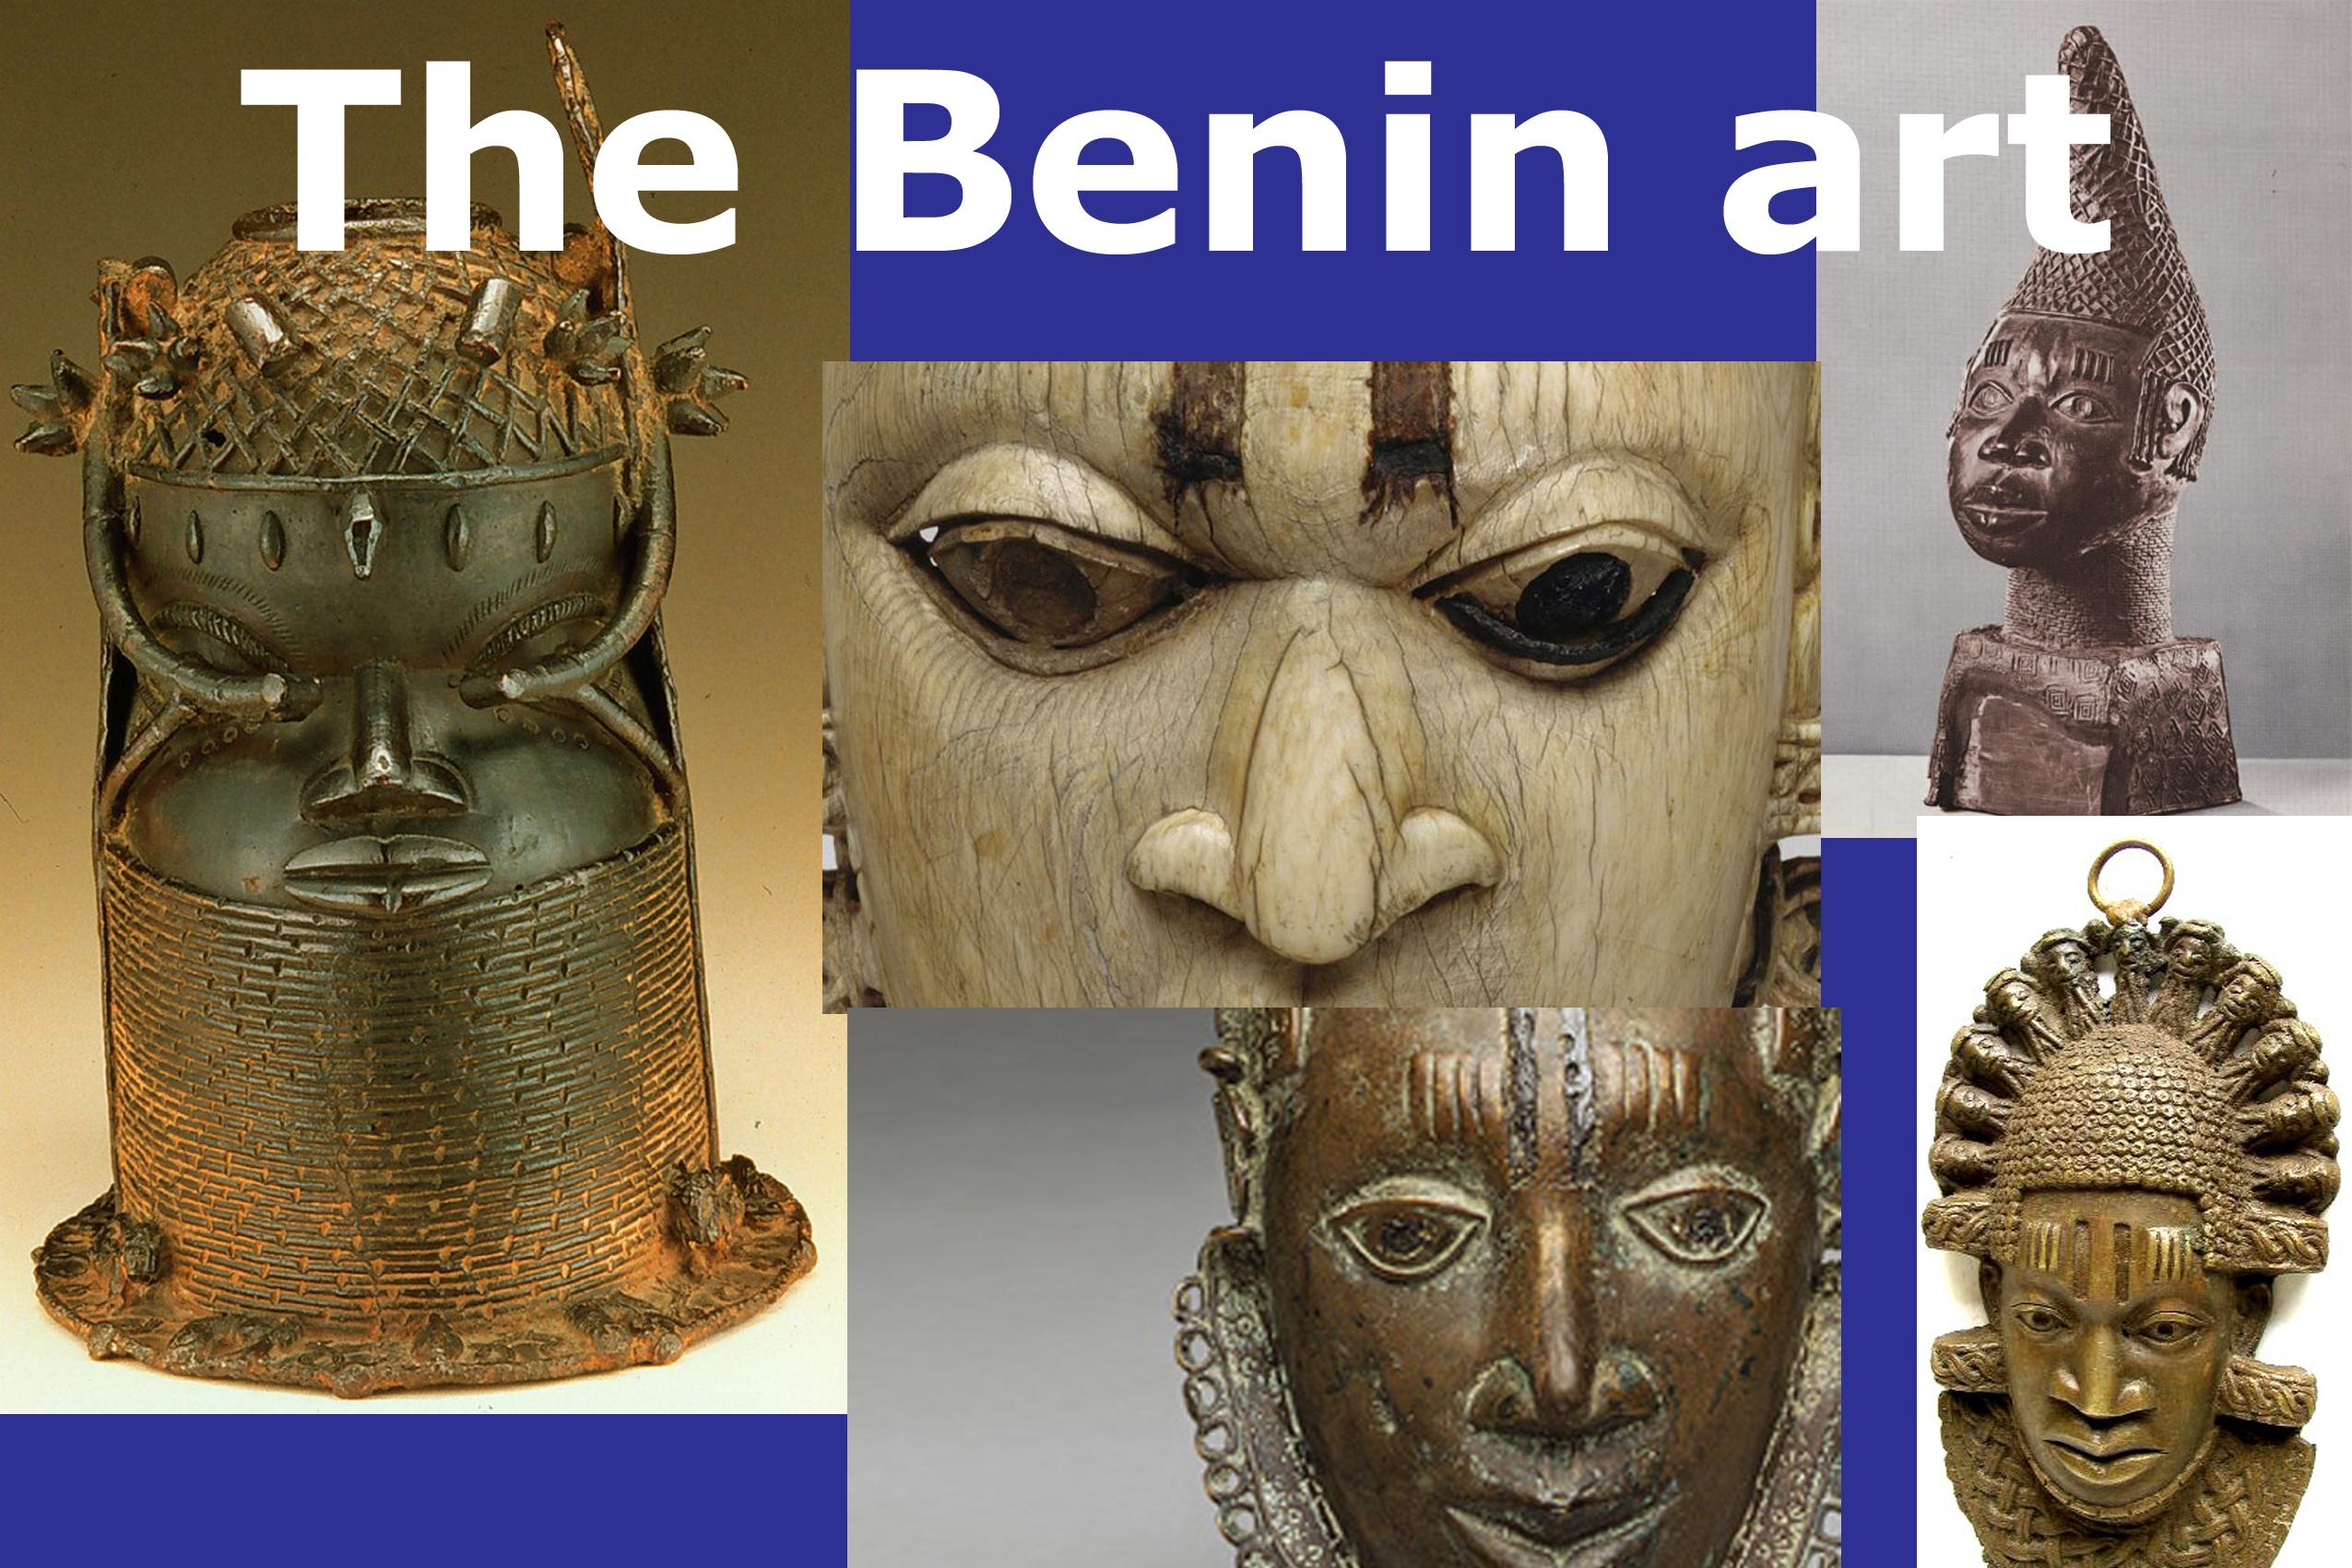 Kingdom of Benin